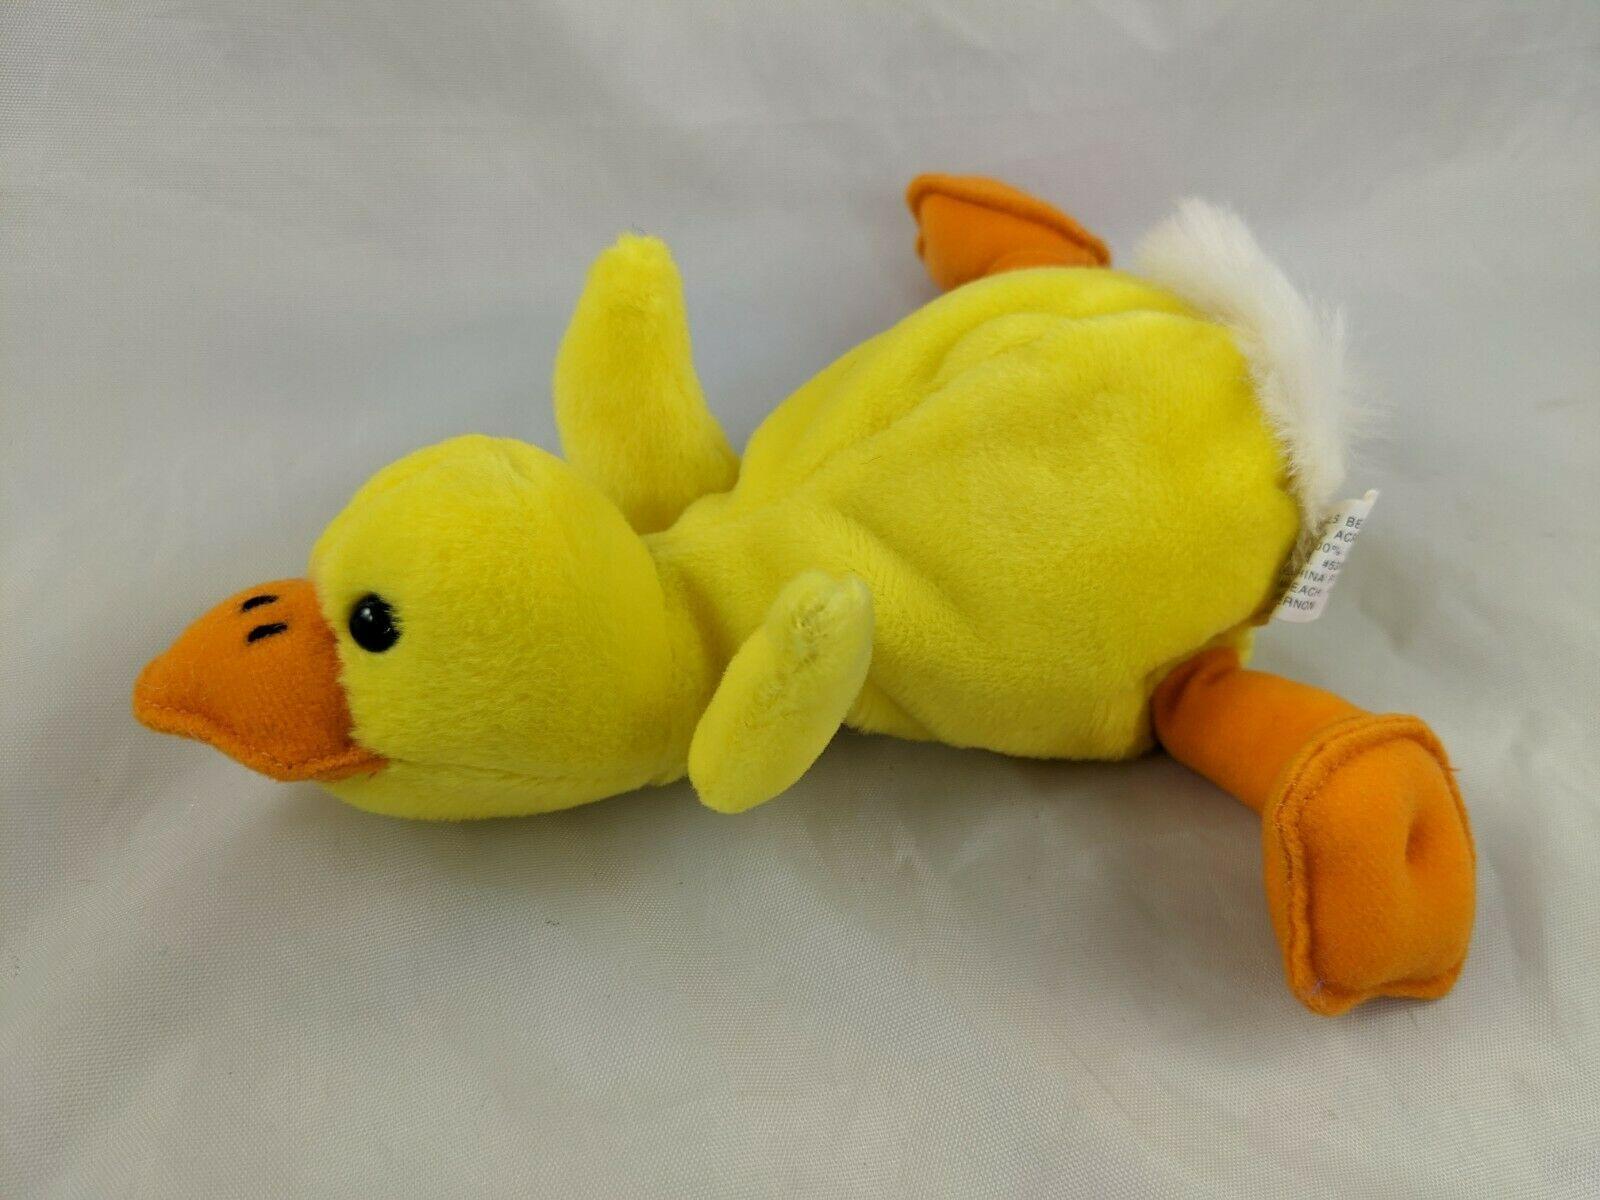 "Yellow Duck Plush Beans 7"" Lillian Vernon Stuffed Animal Toy - $9.95"